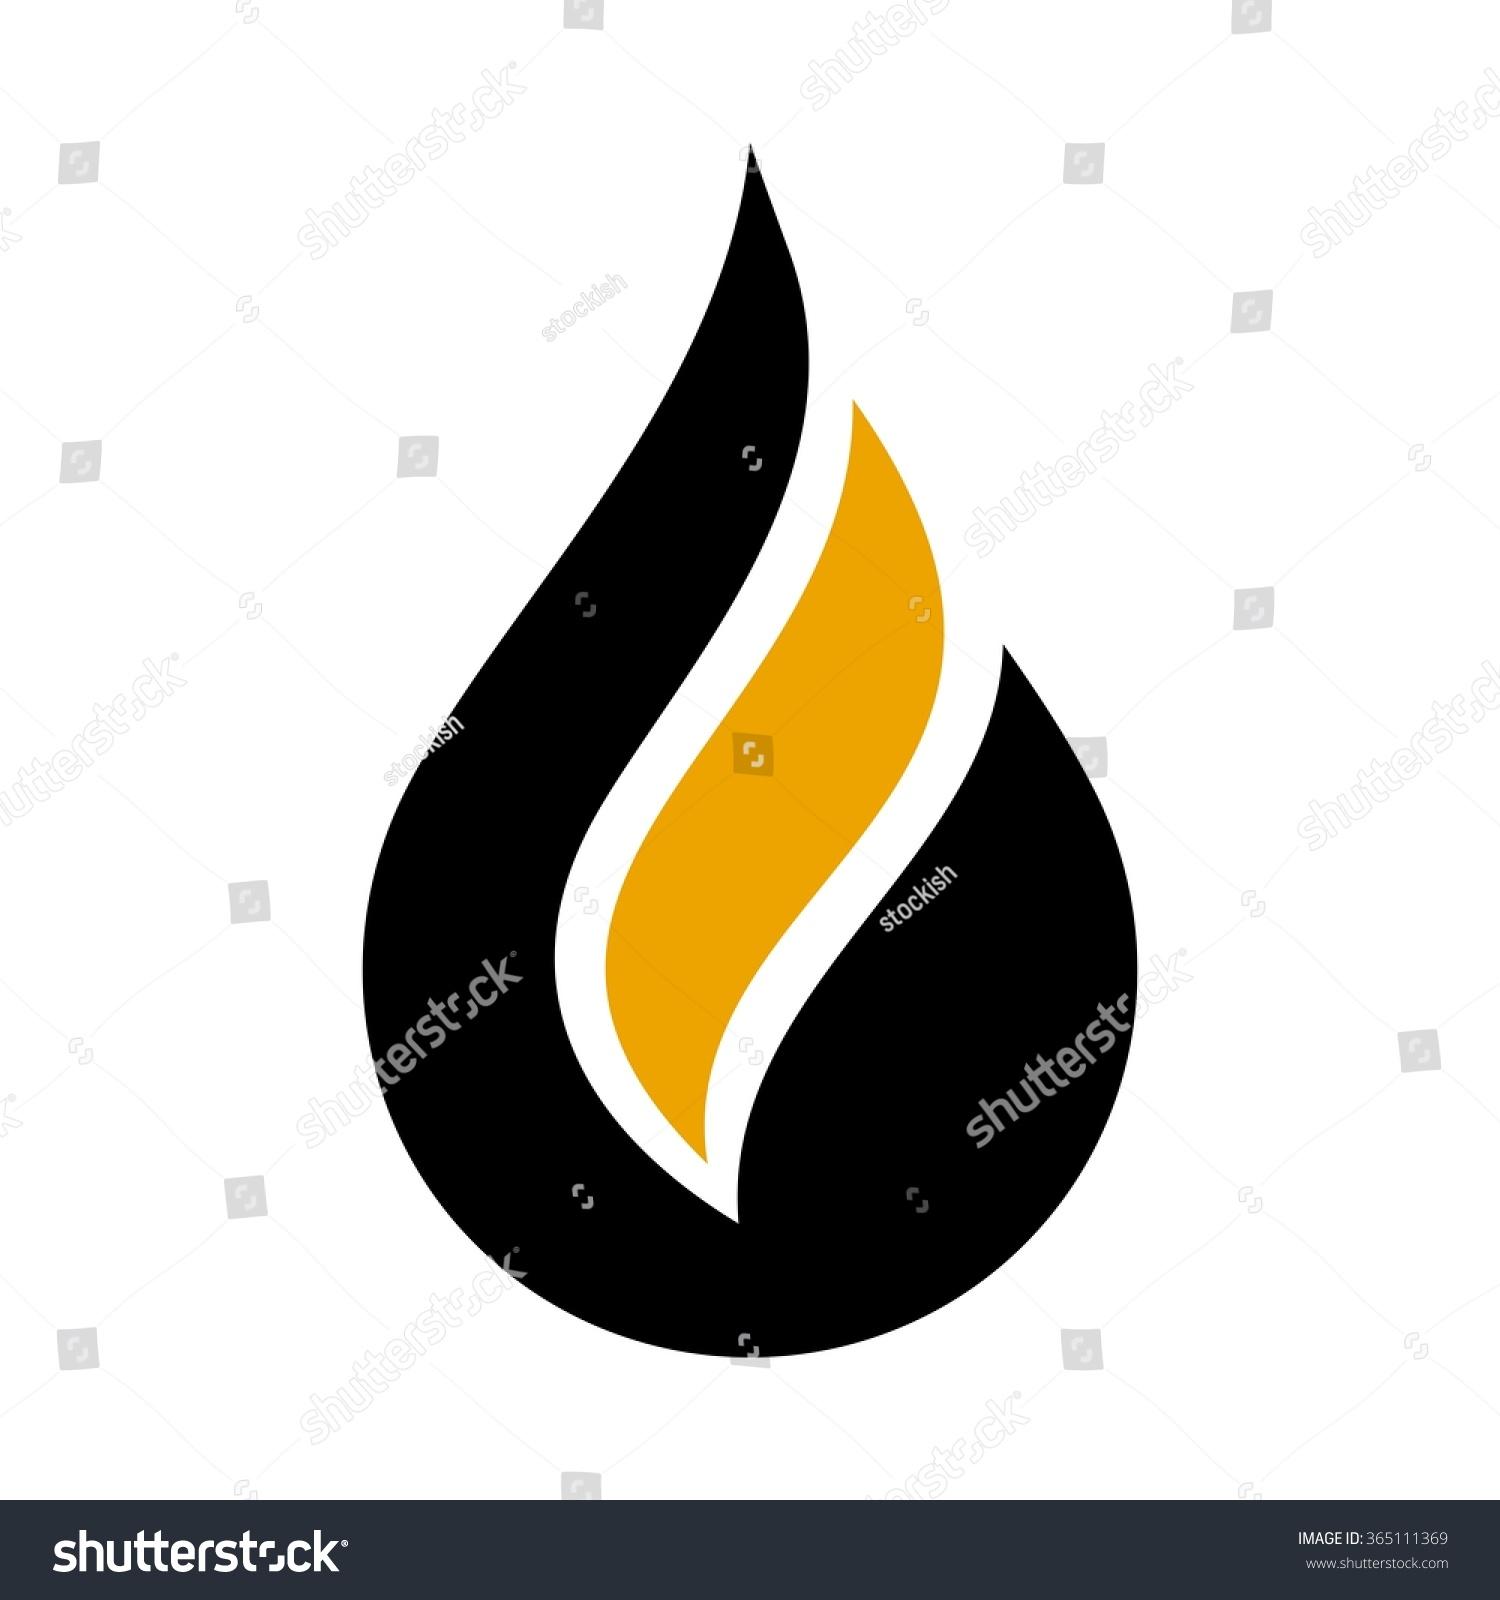 water or oil drop logo vector 365111369 shutterstock